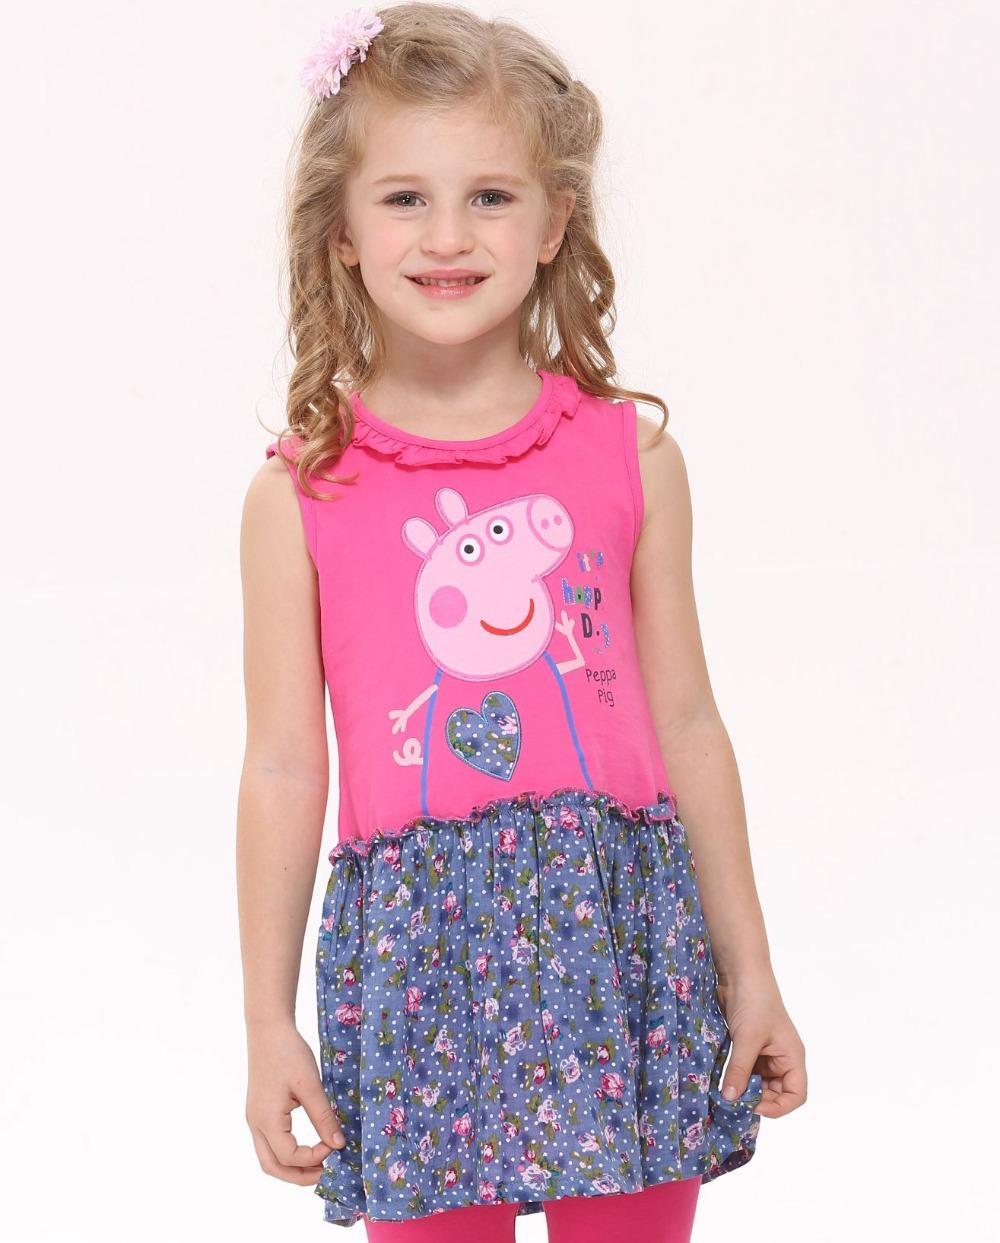 Baby dresses for girls baby dress - Kids Wear For Girls Free Shipping 18m 6y New Nova